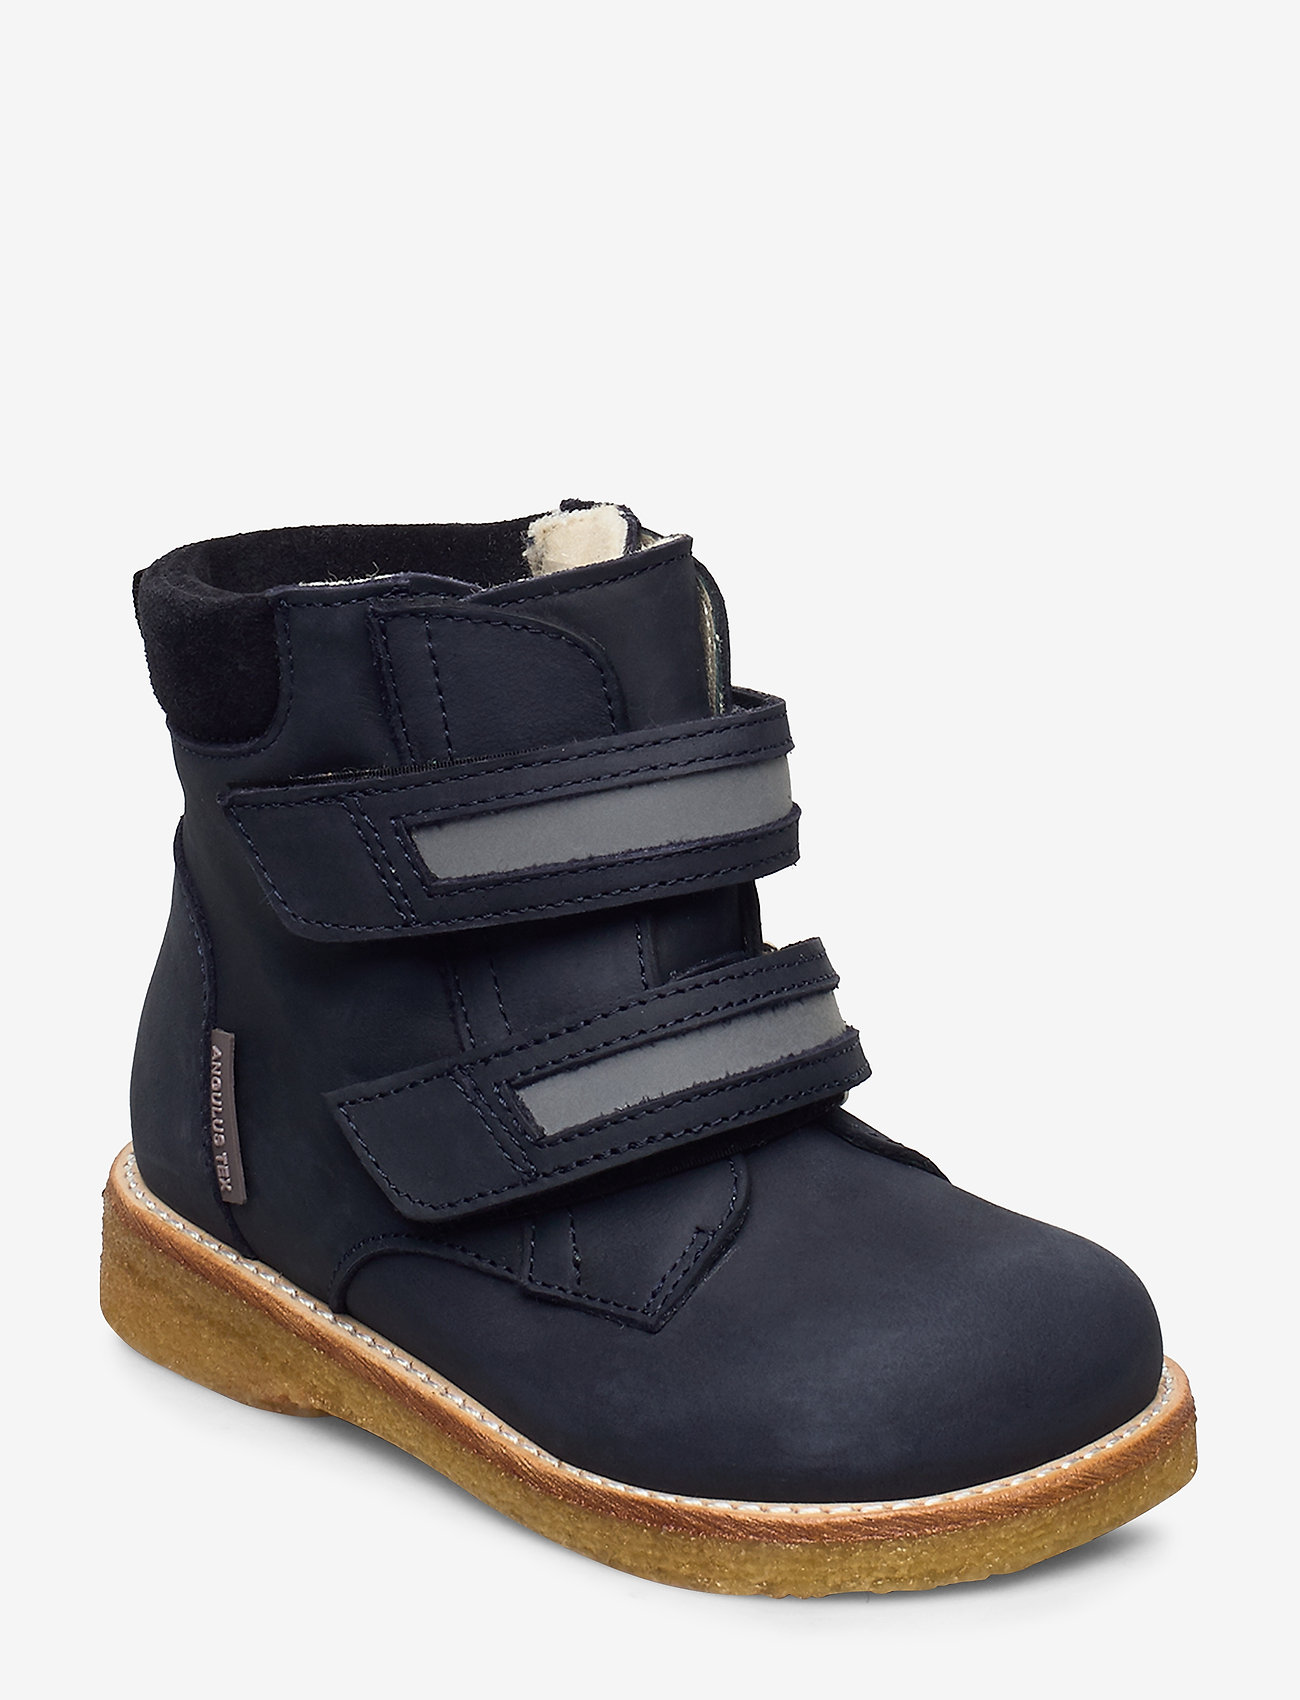 ANGULUS - Boots - flat - with velcro - lauflernschuhe - 1587/2012/2215/2022 navy/refle - 0